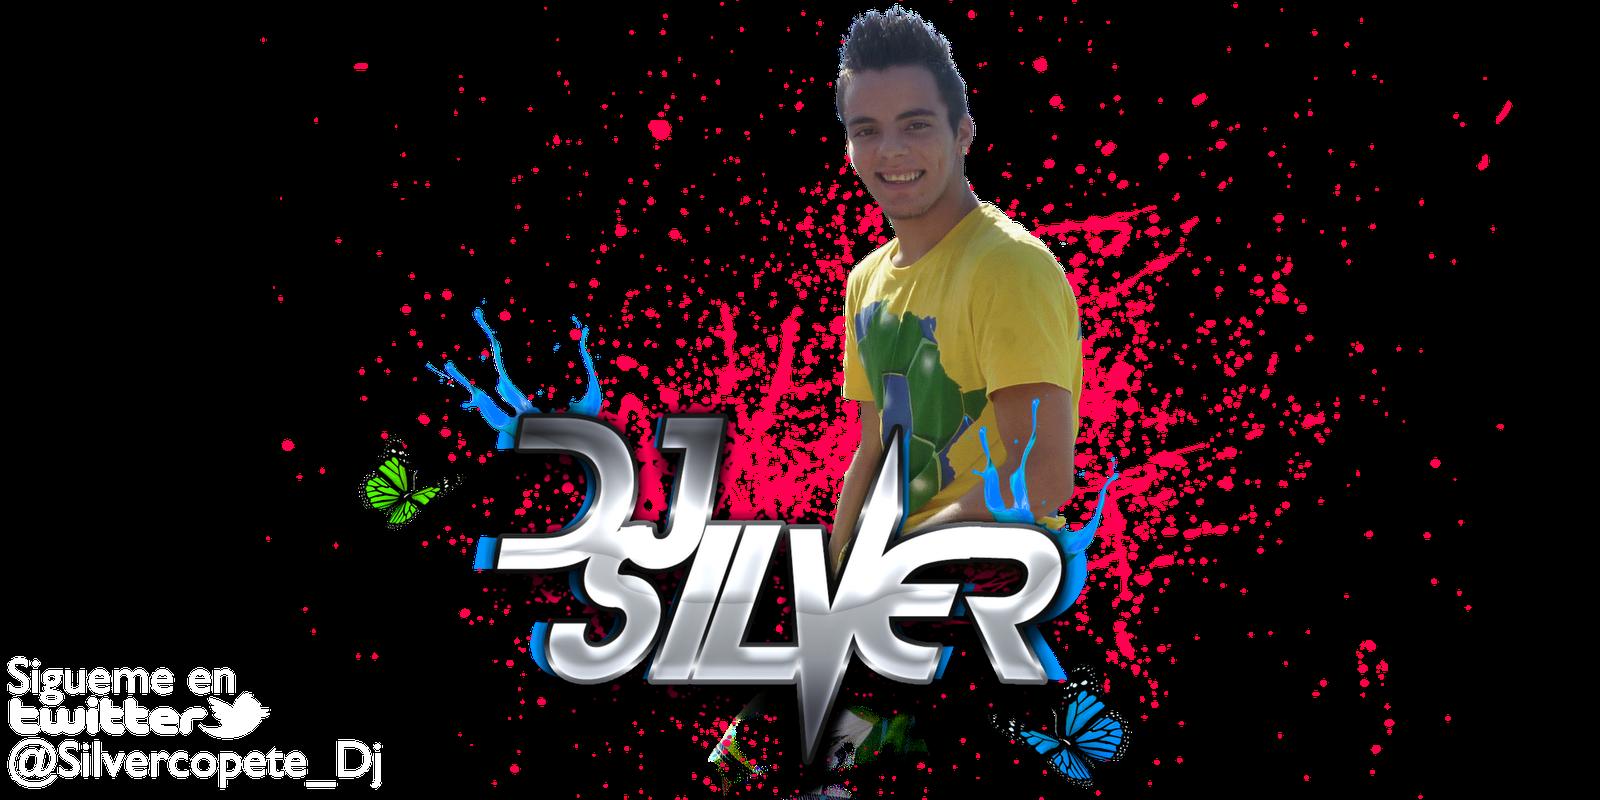 .: Dj Silver :.